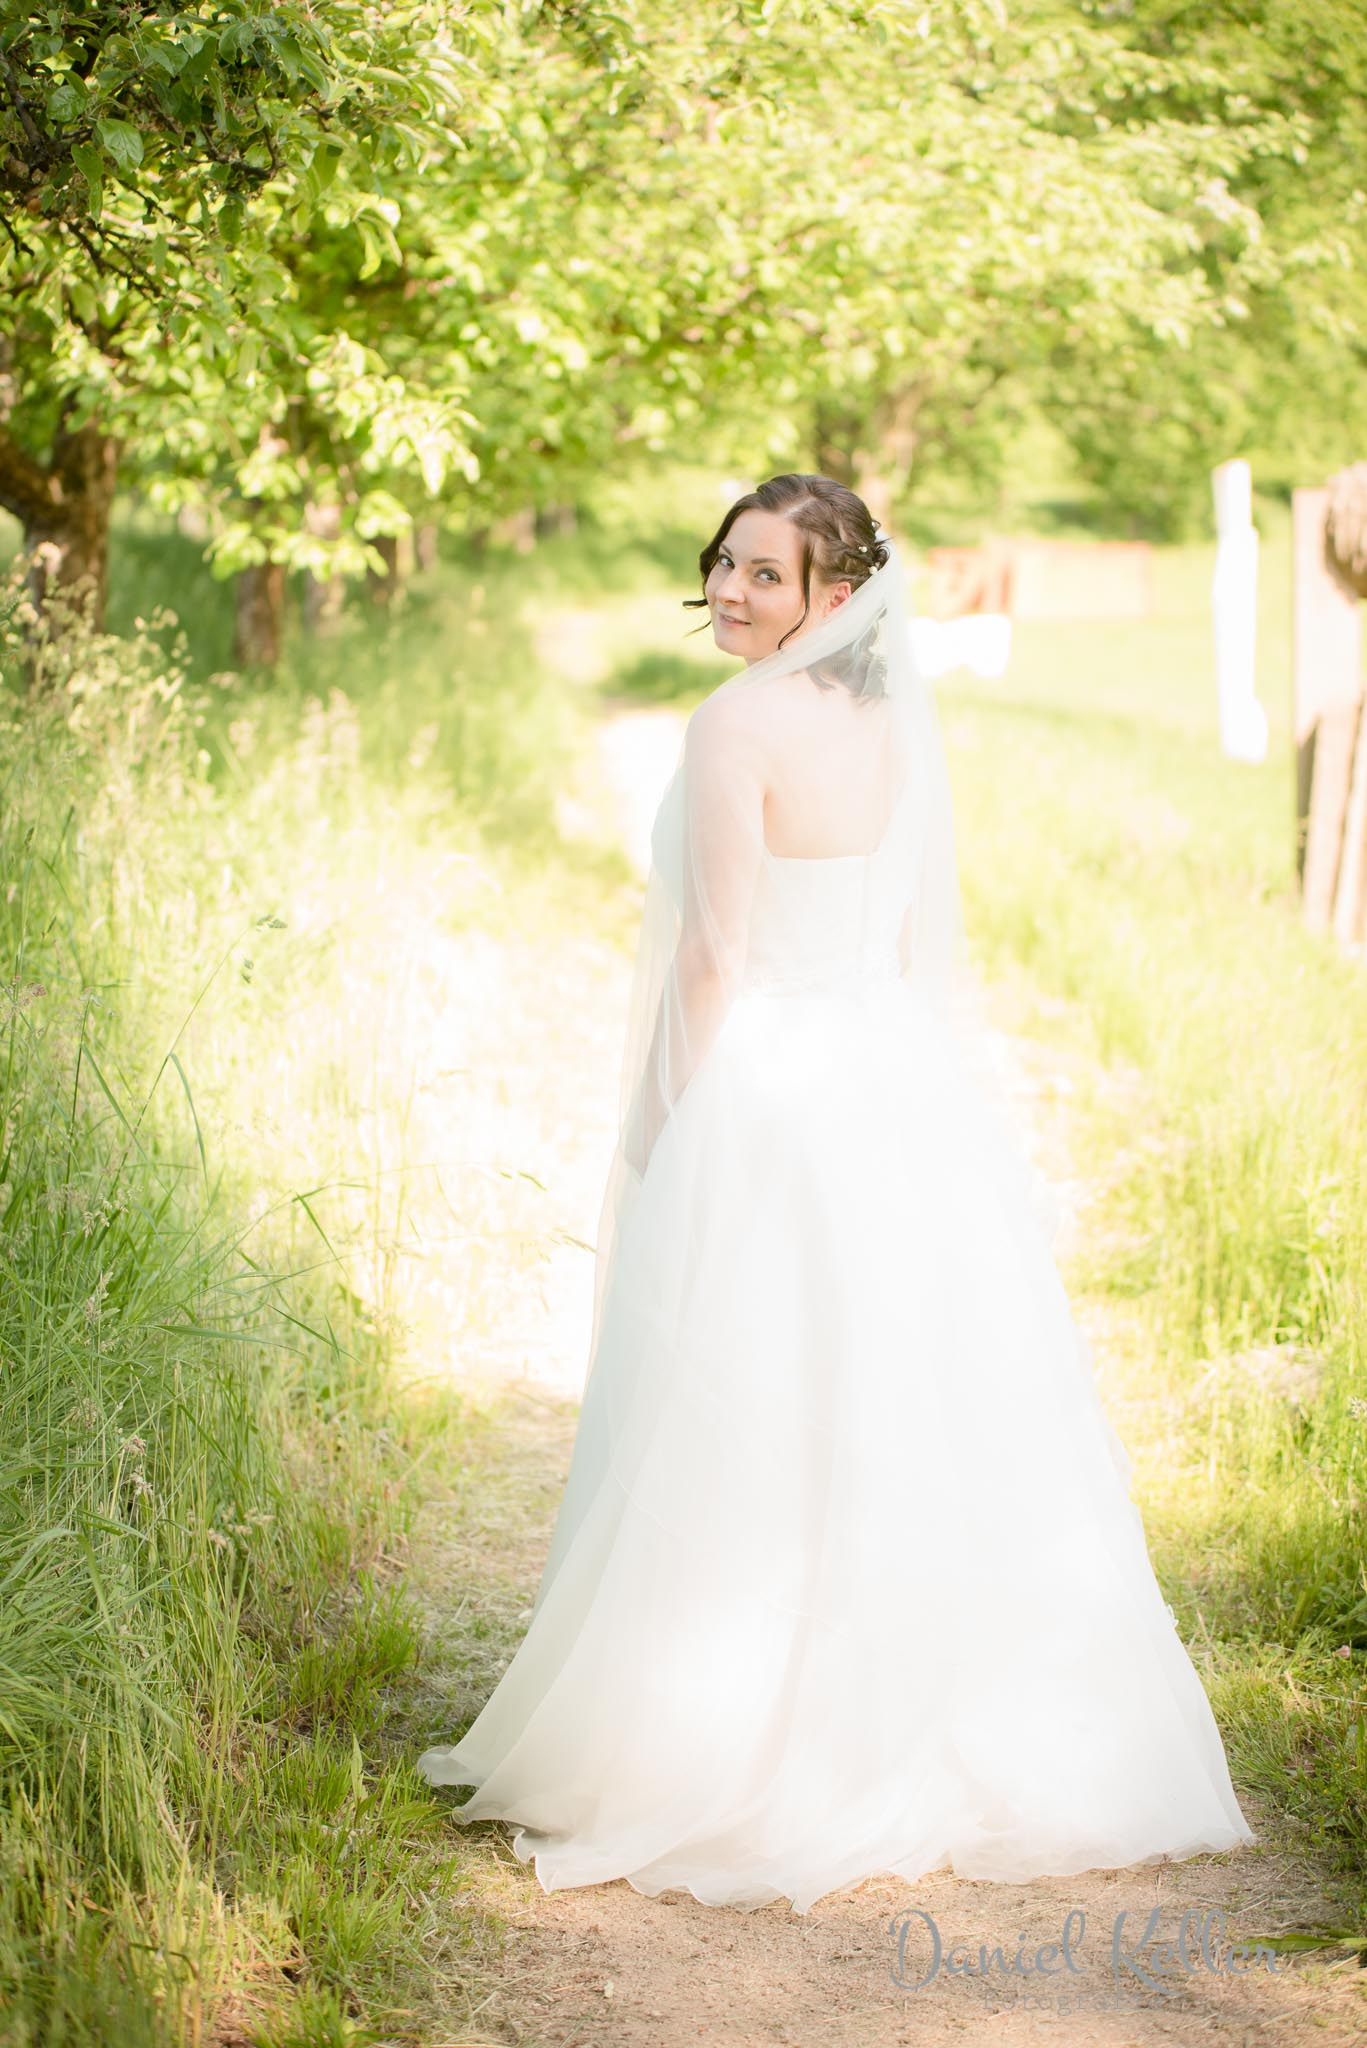 Hochzeitsfotograf Karlsruhe Daniel Keller Fotografie